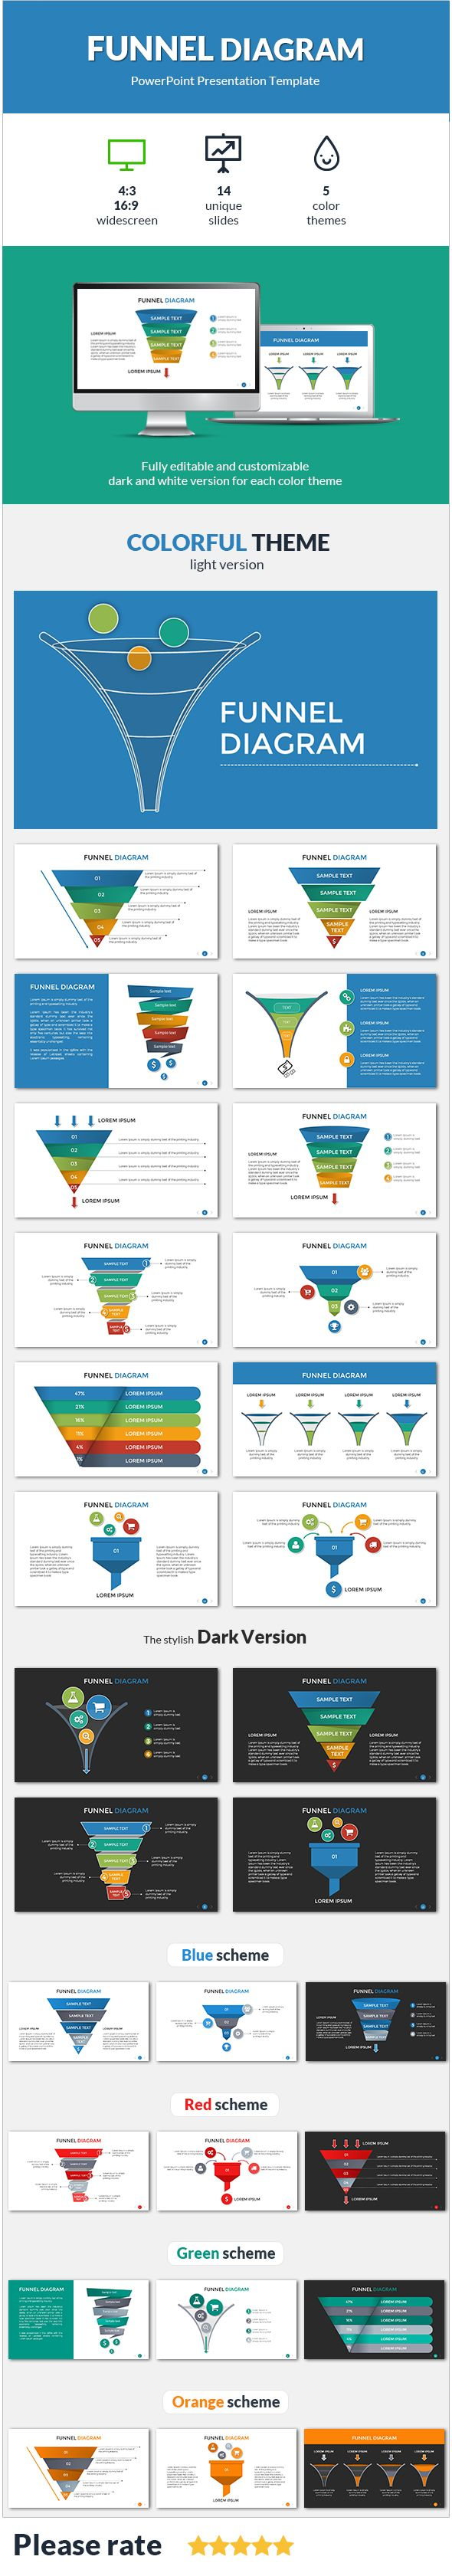 Funnel Diagram Presentation Template (PowerPoint Templates)